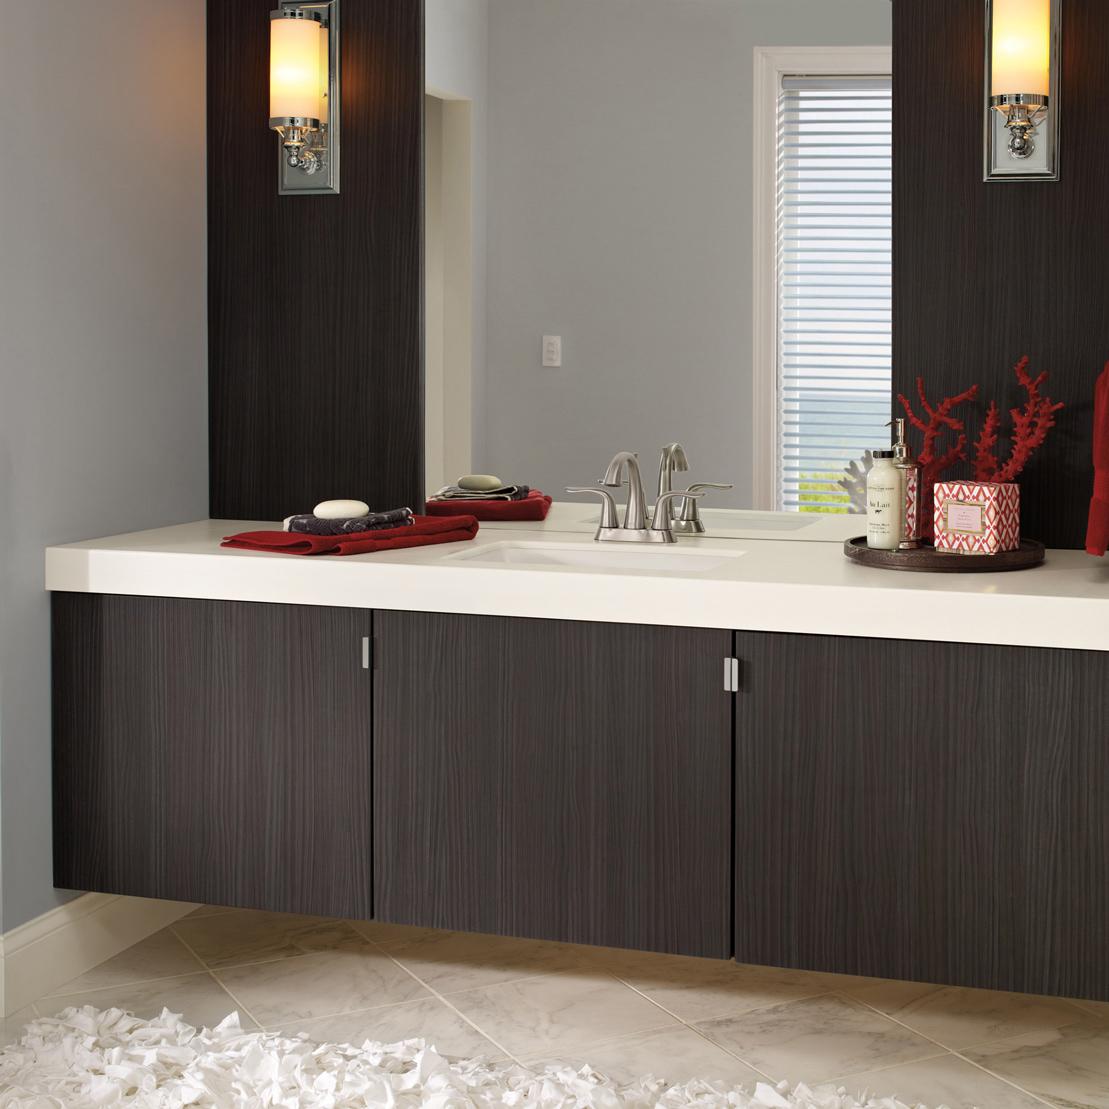 Bath4All - Delta 2538-mpu-dst Lahara Centerset Bathroom Faucet with ...